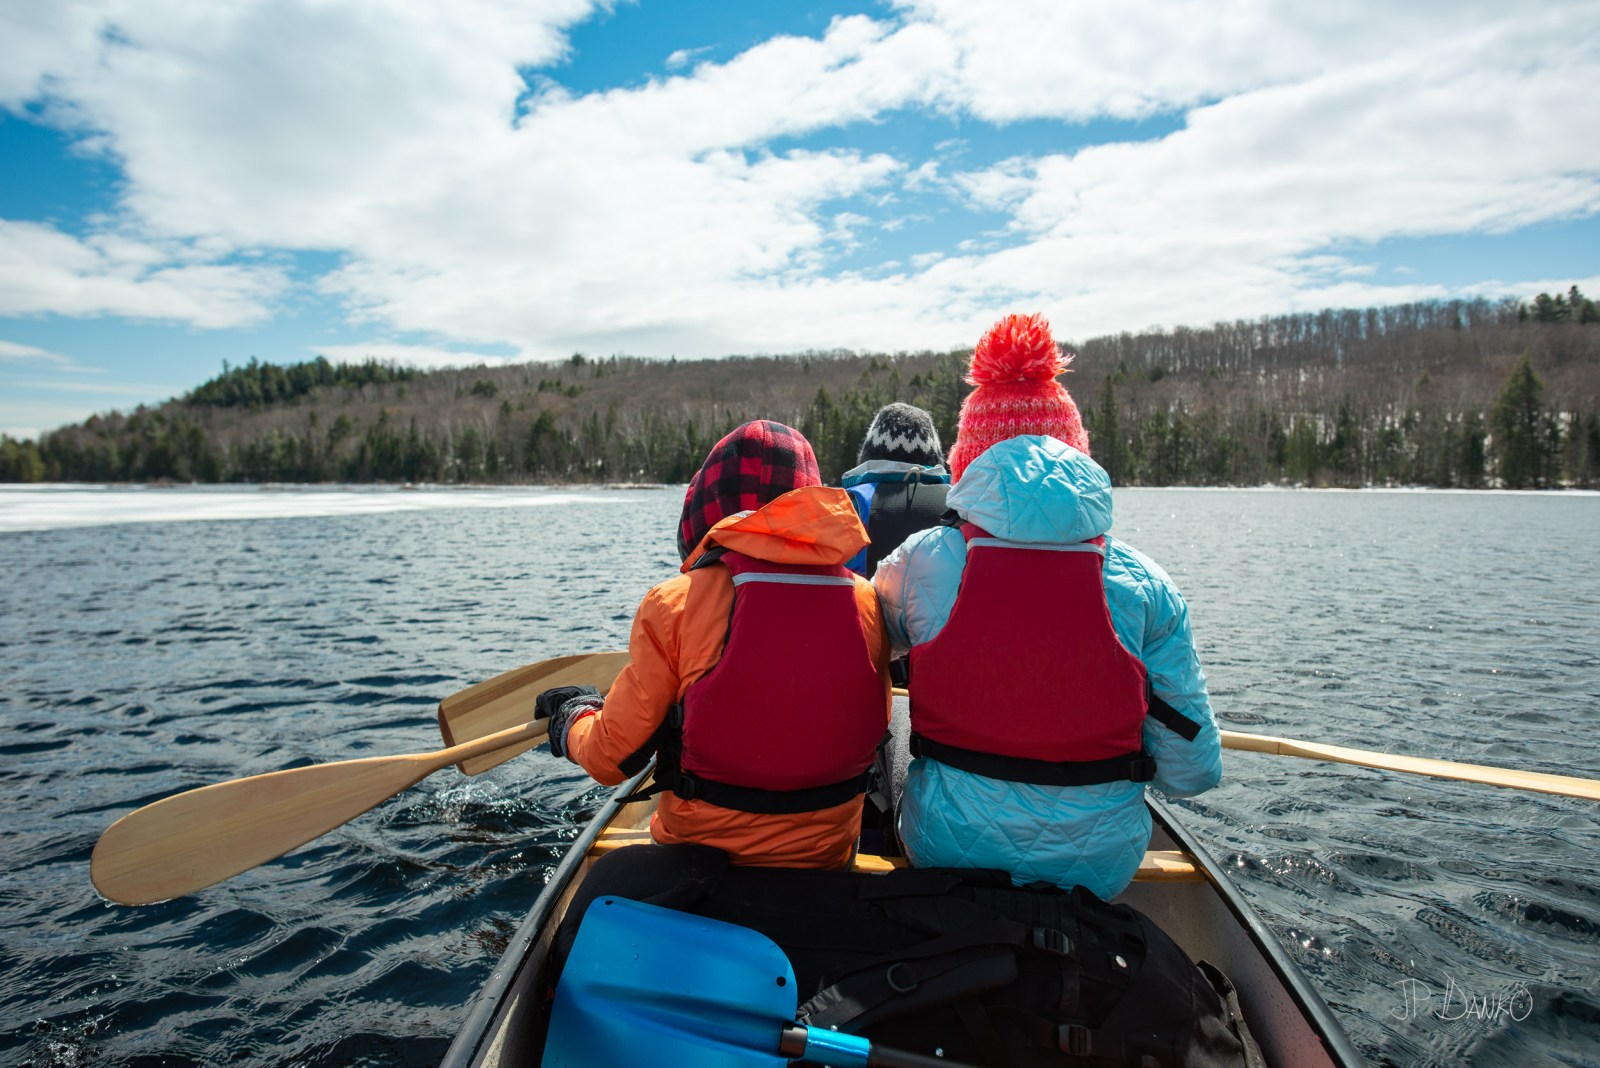 Family Paddling Spring Canoe Trip Backcountry Wilderness Ice Lak